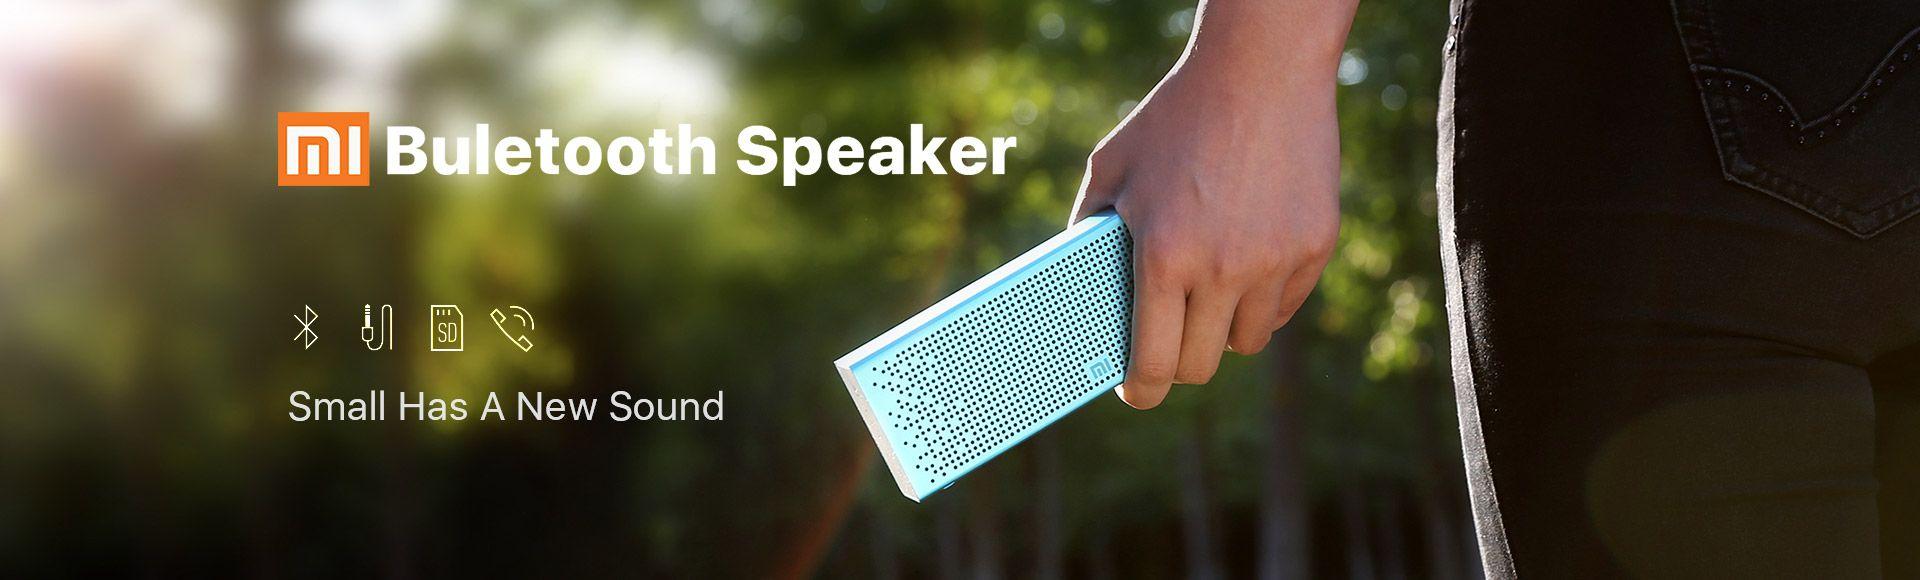 Xiaomi Mi Portable Wireless Bluetooth Speaker - Stereo Pocket Audio Support Handsfree TF Card AUX-in